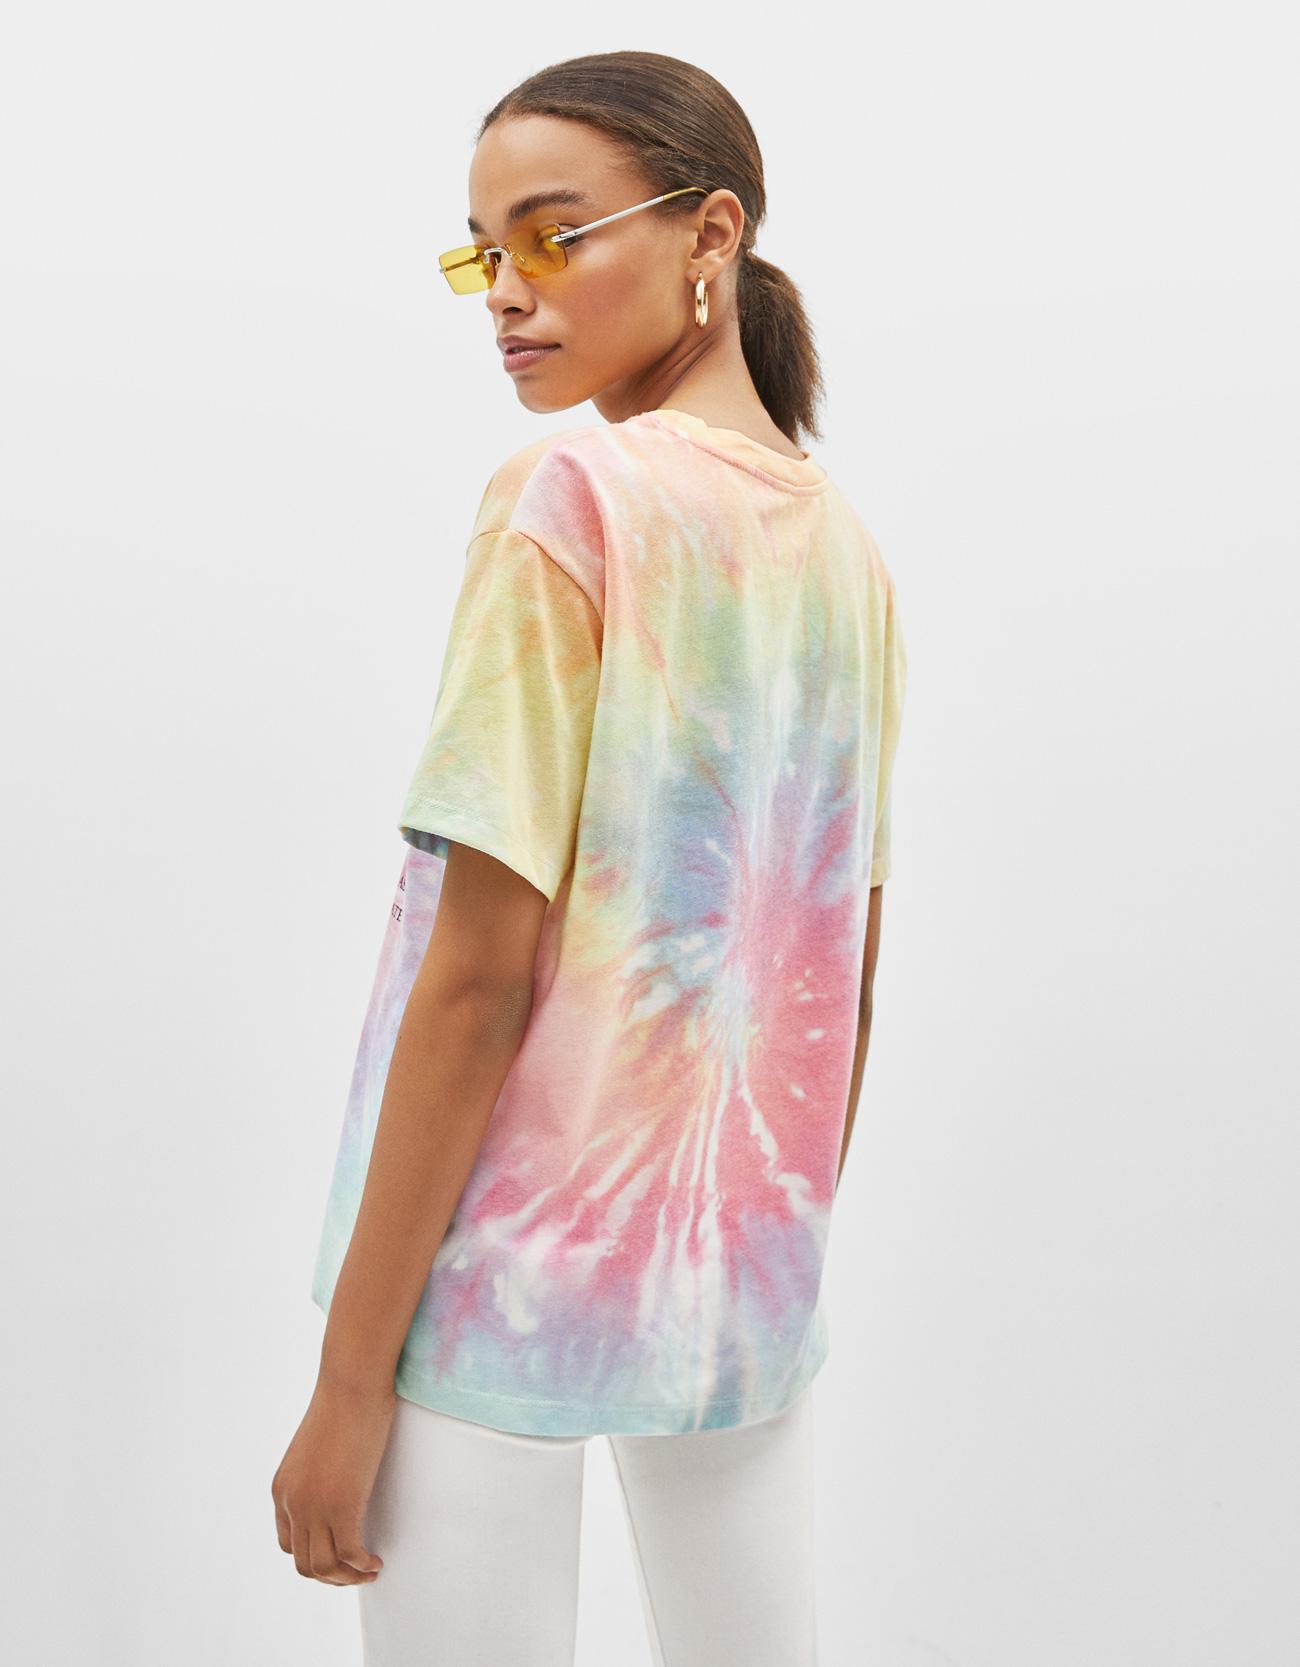 f48e1332f Tie-dye T-shirt with slogan print - Denim Collection - Bershka Georgia